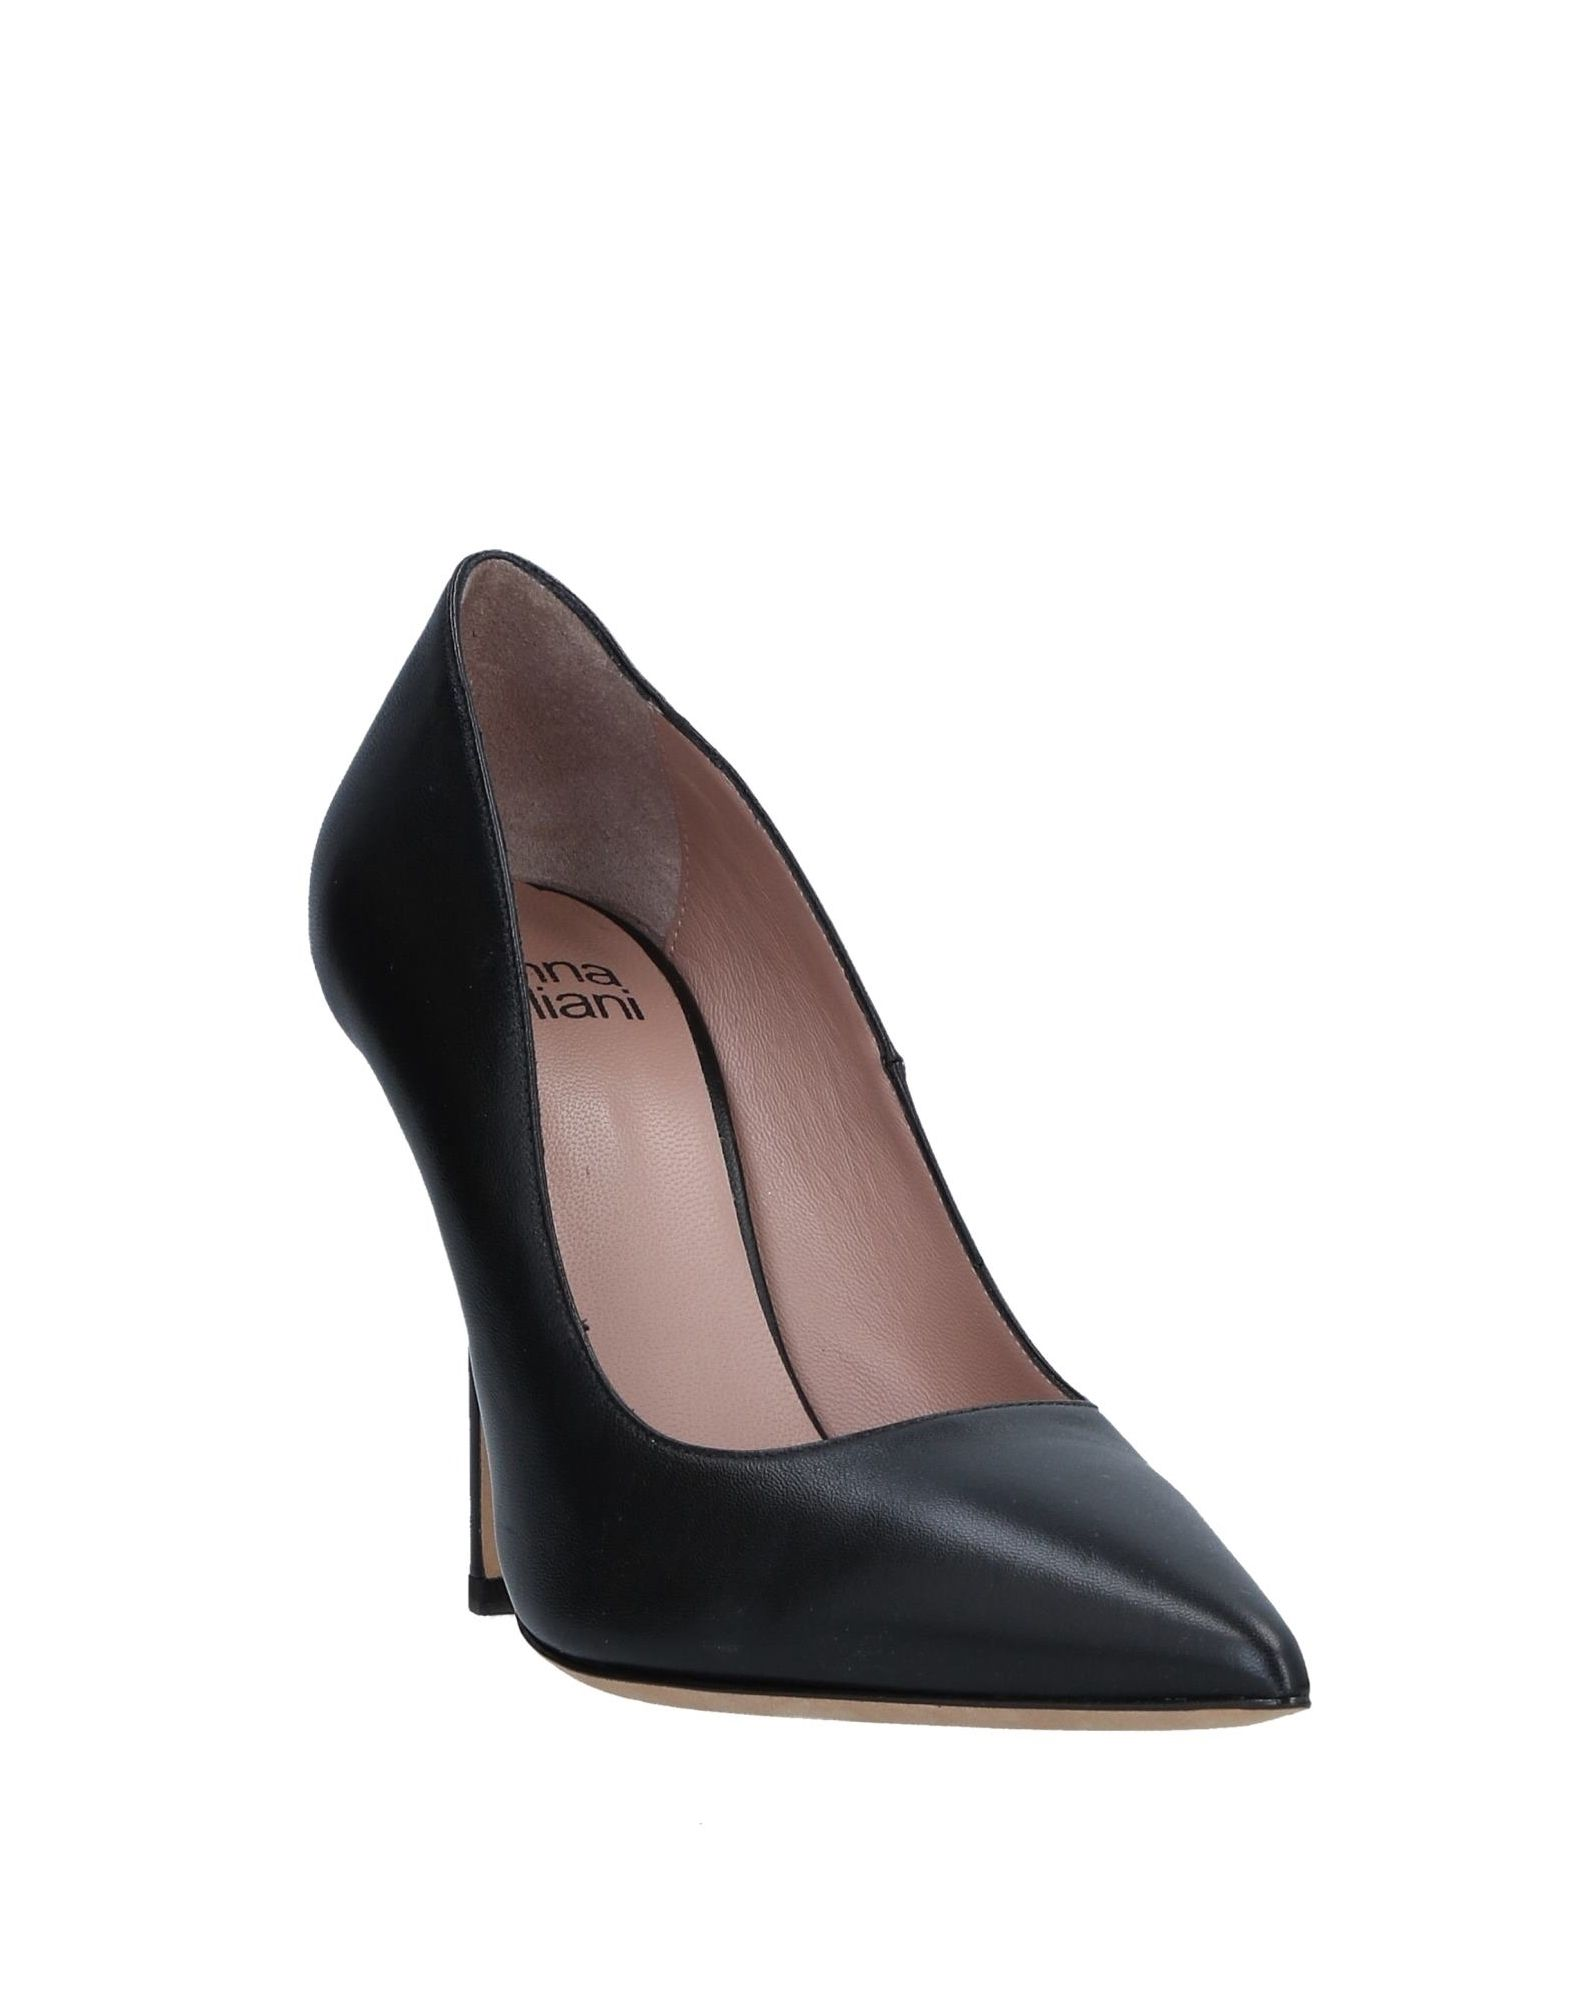 Stilvolle billige Schuhe Gianna  Meliani Pumps Damen  Gianna 11507127NG e878ce